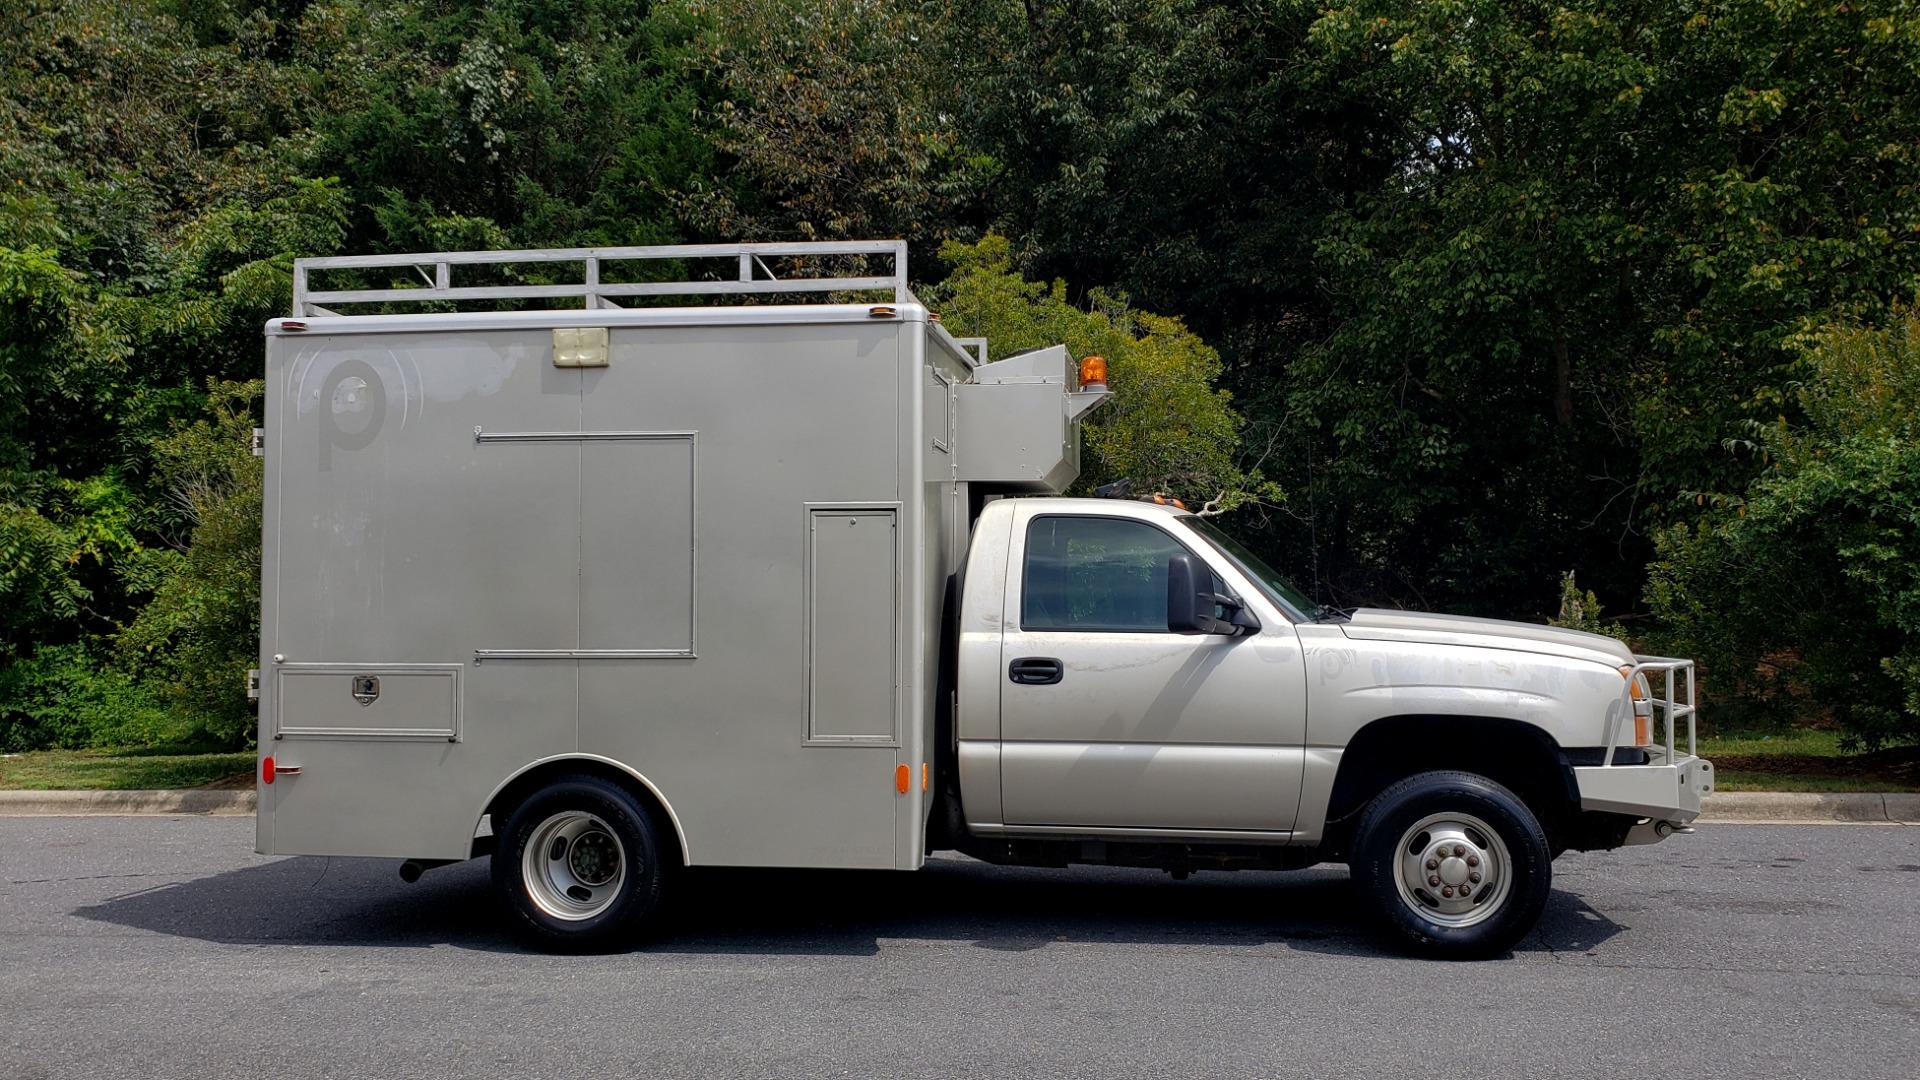 Used 2005 Chevrolet SILVERADO 3500 DRW / 4WD / REG CAB / 6.6L DURAMAX / DOOMSDAY PREPPER for sale $21,595 at Formula Imports in Charlotte NC 28227 5